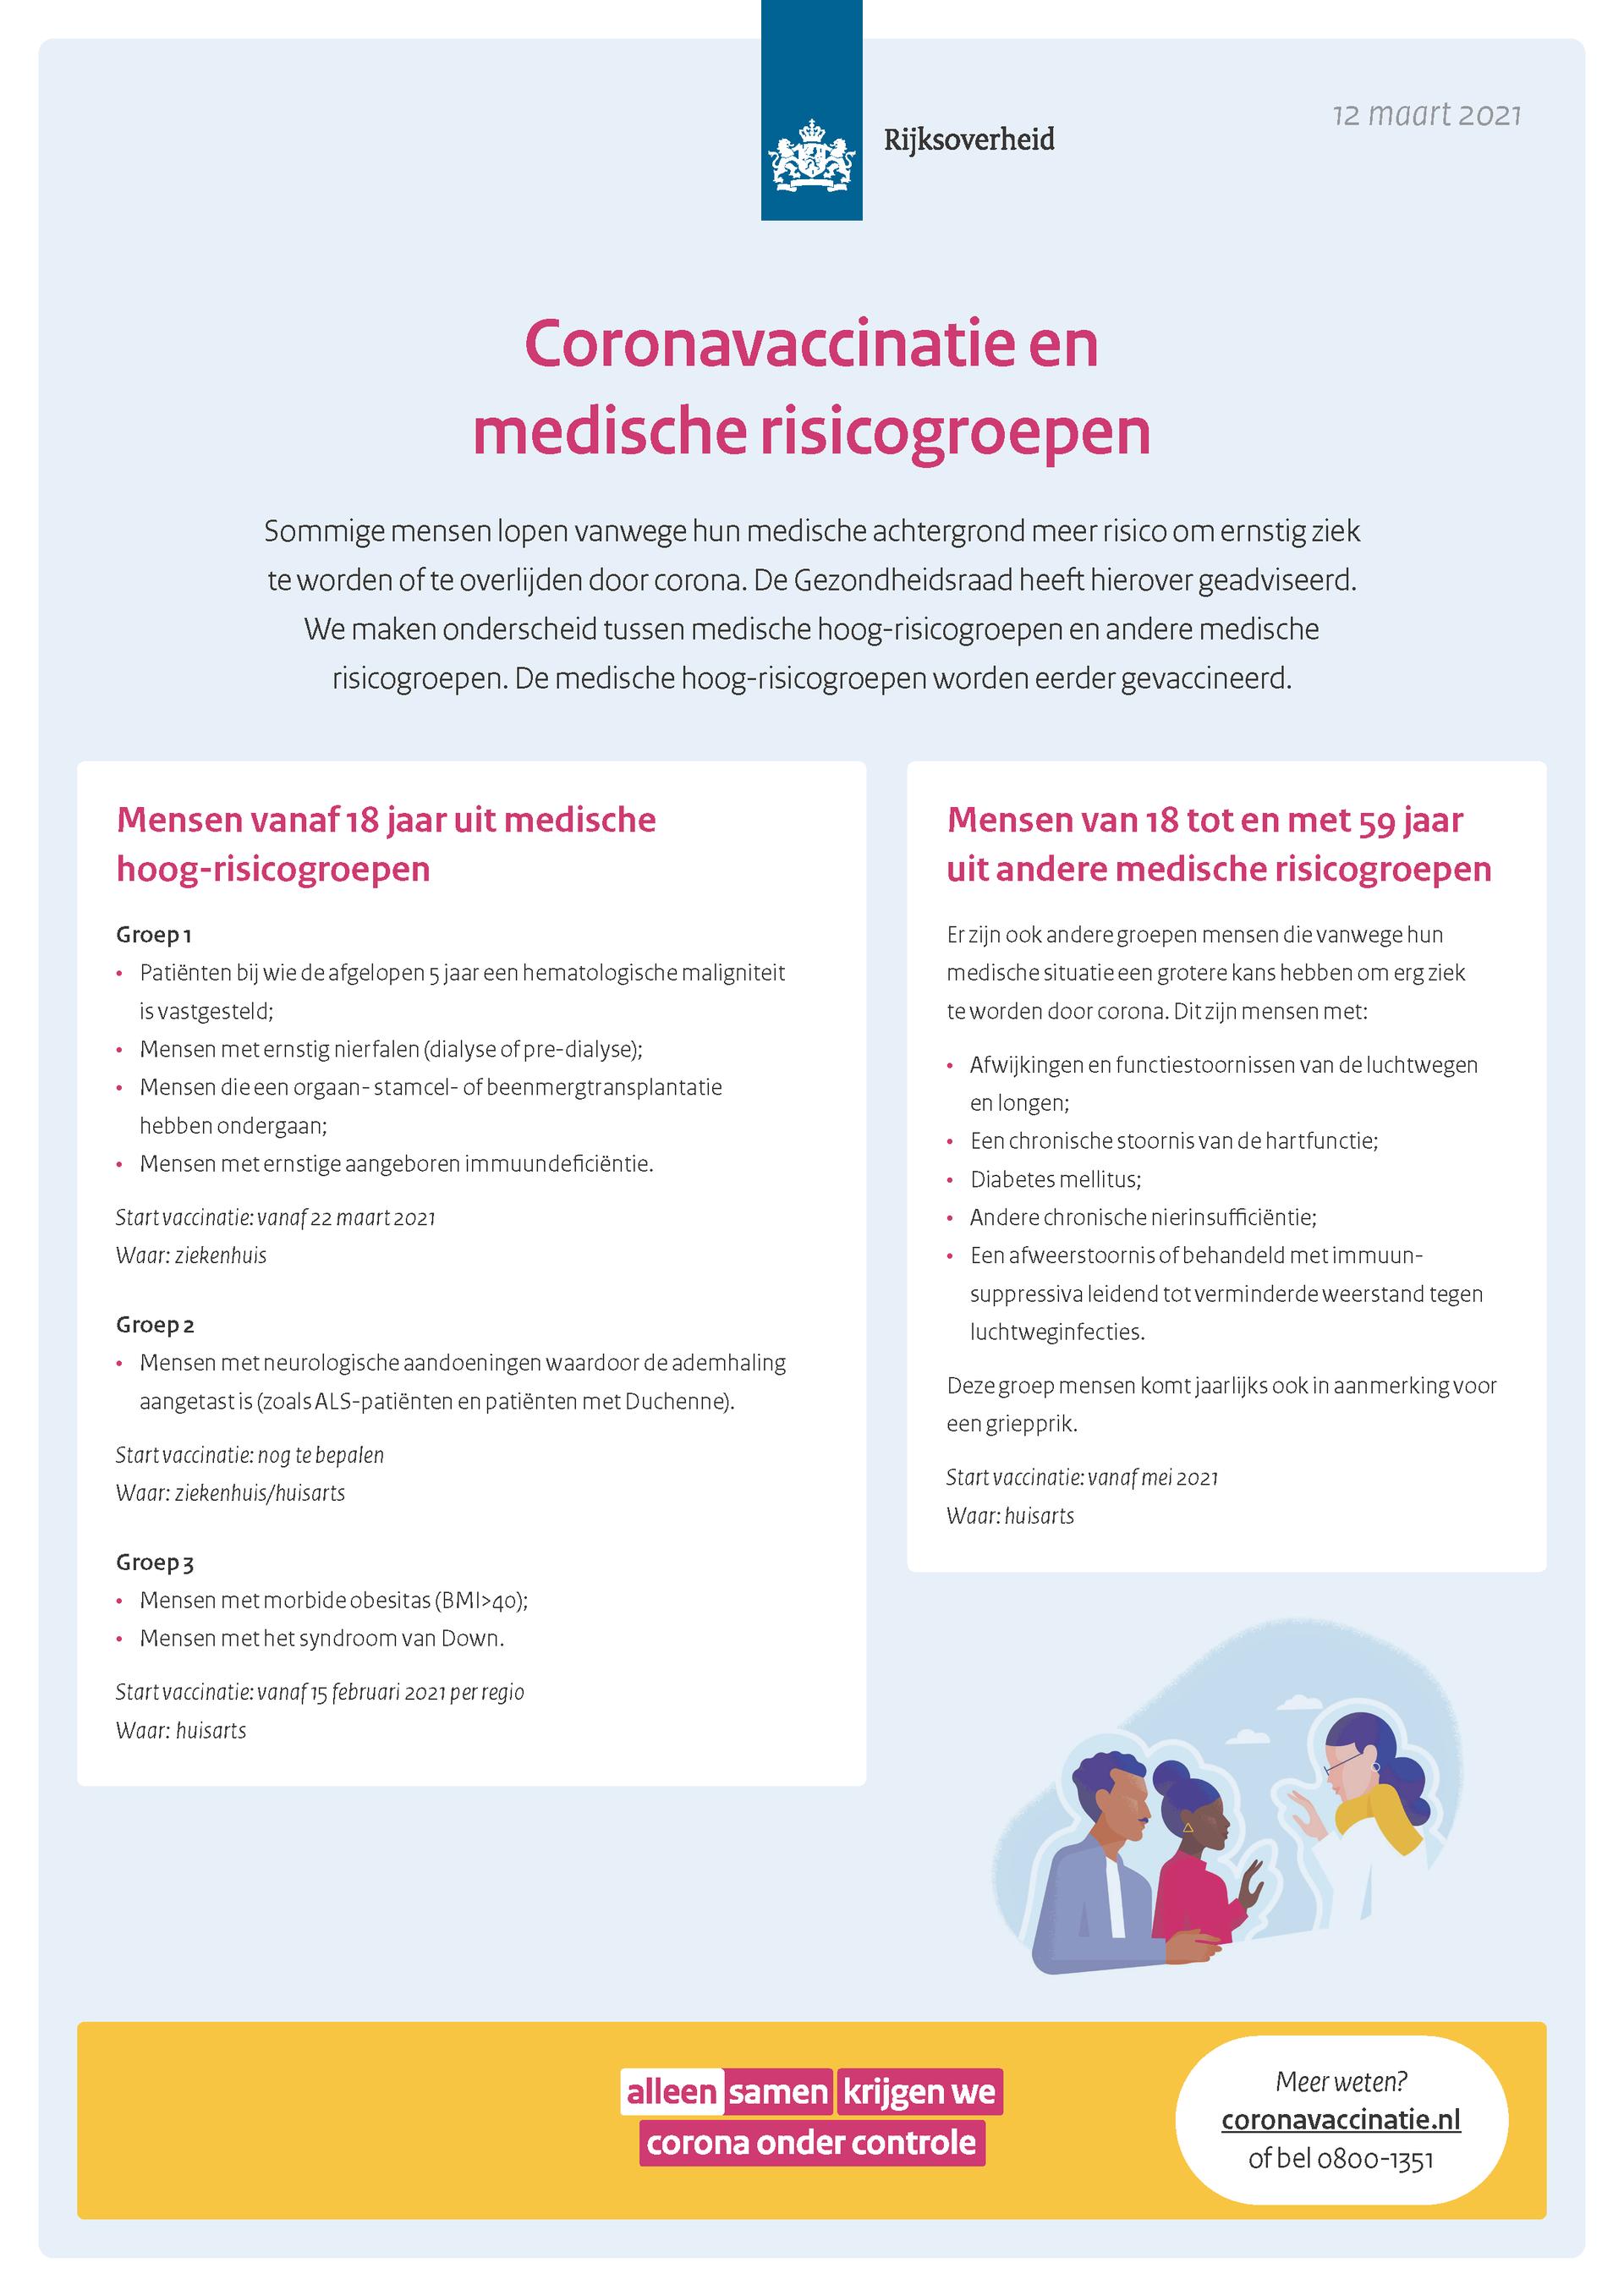 Medische risicogroepen